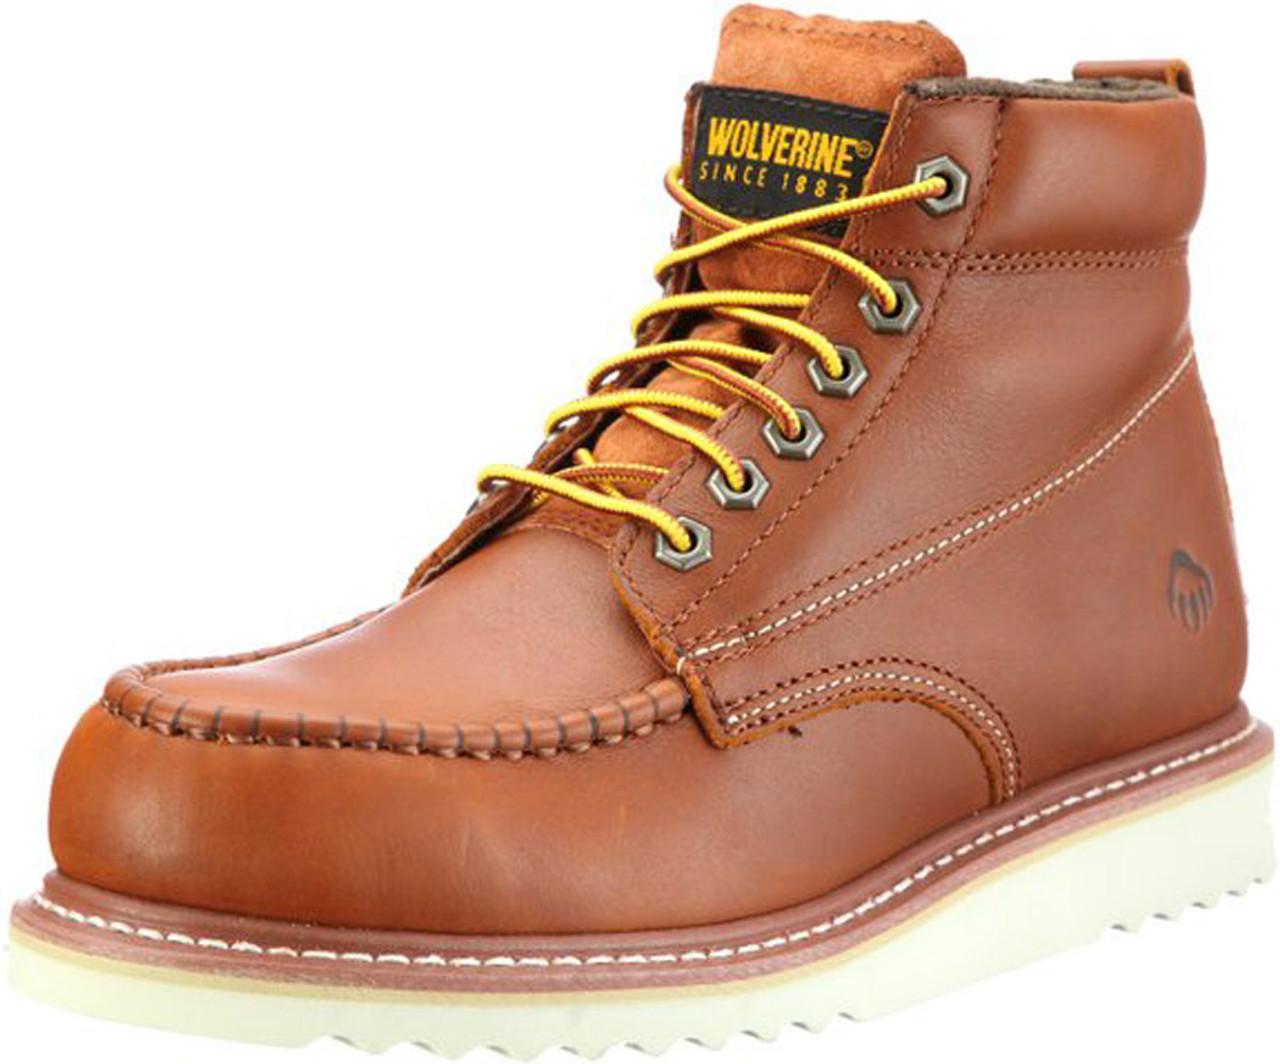 60674094f97 Wolverine W09093 Mens Apprentice Hi-Nubuck Honey Wedge Boot